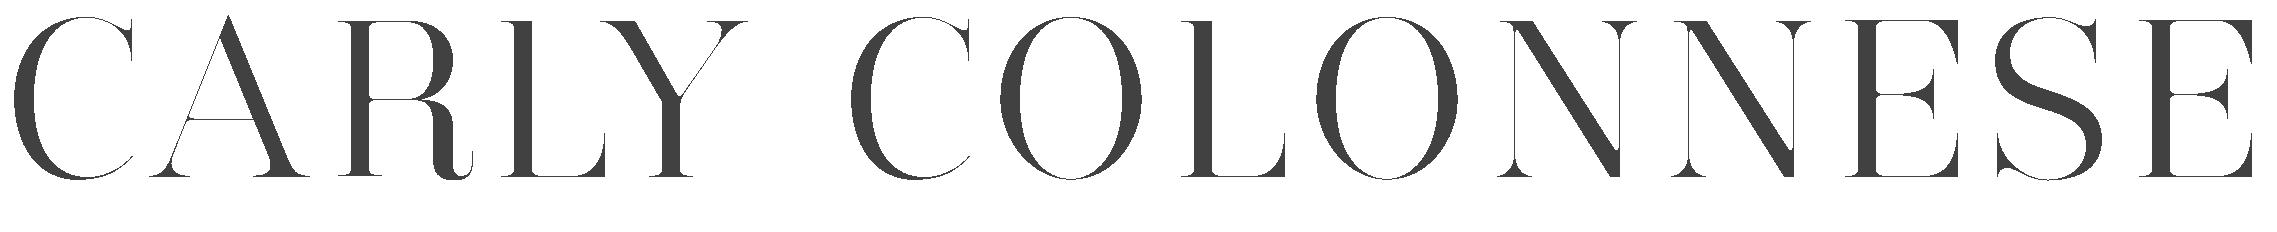 cc-logo.png